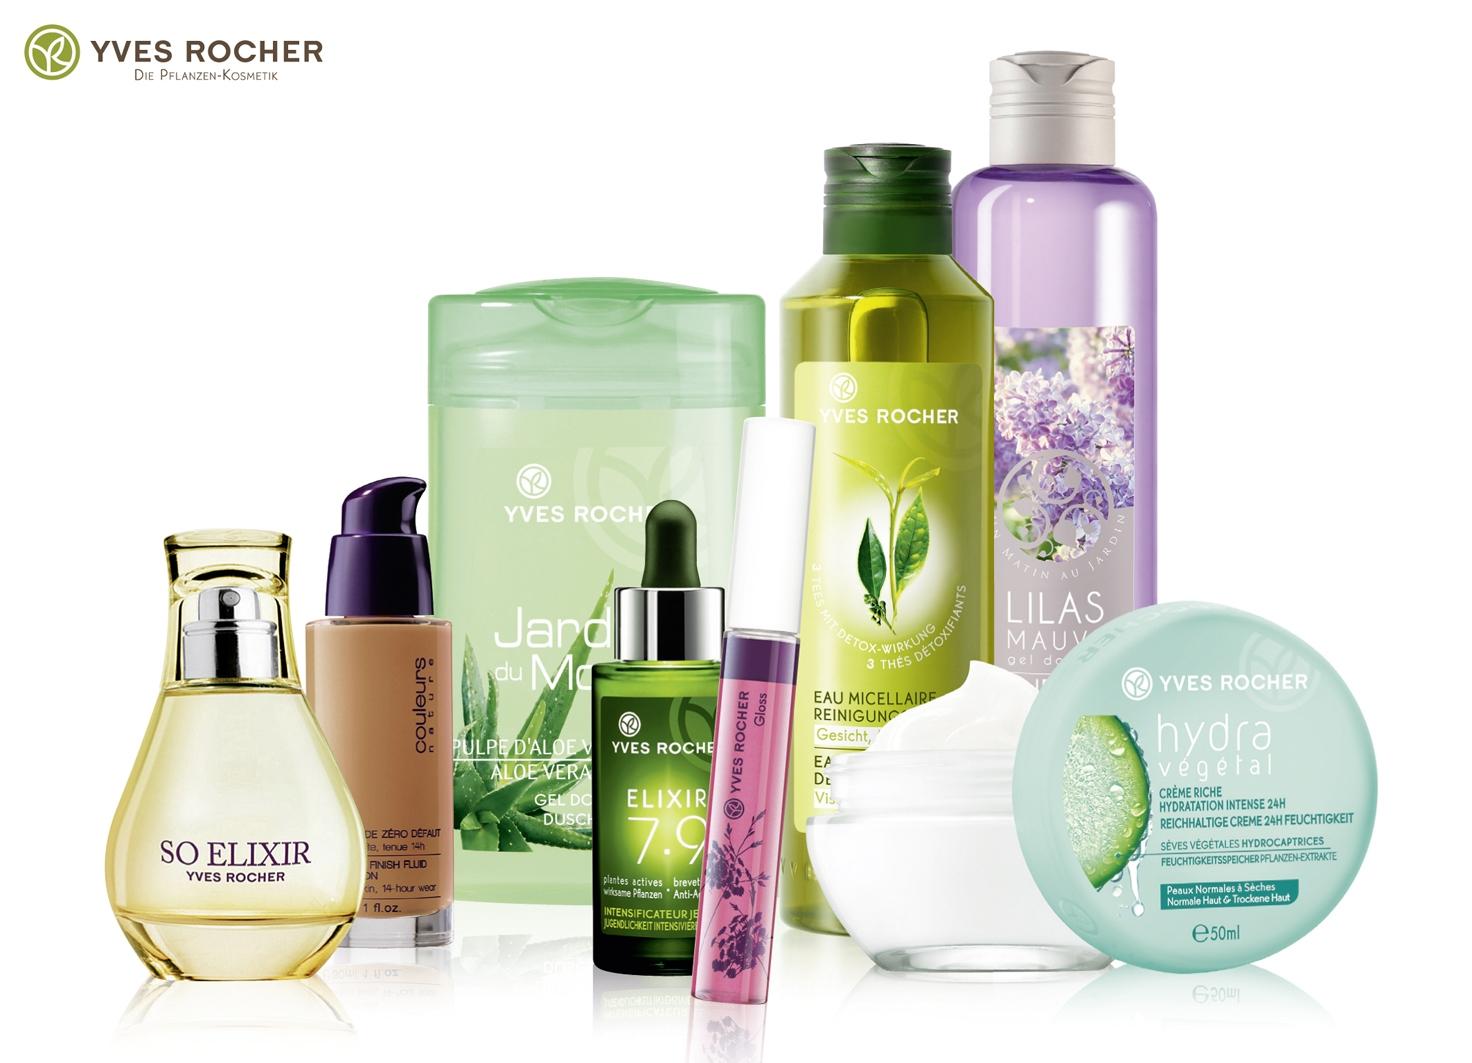 Косметика Yves Rocher история марки, демакияж, мицеллярная вода, средства для снятия макияжа